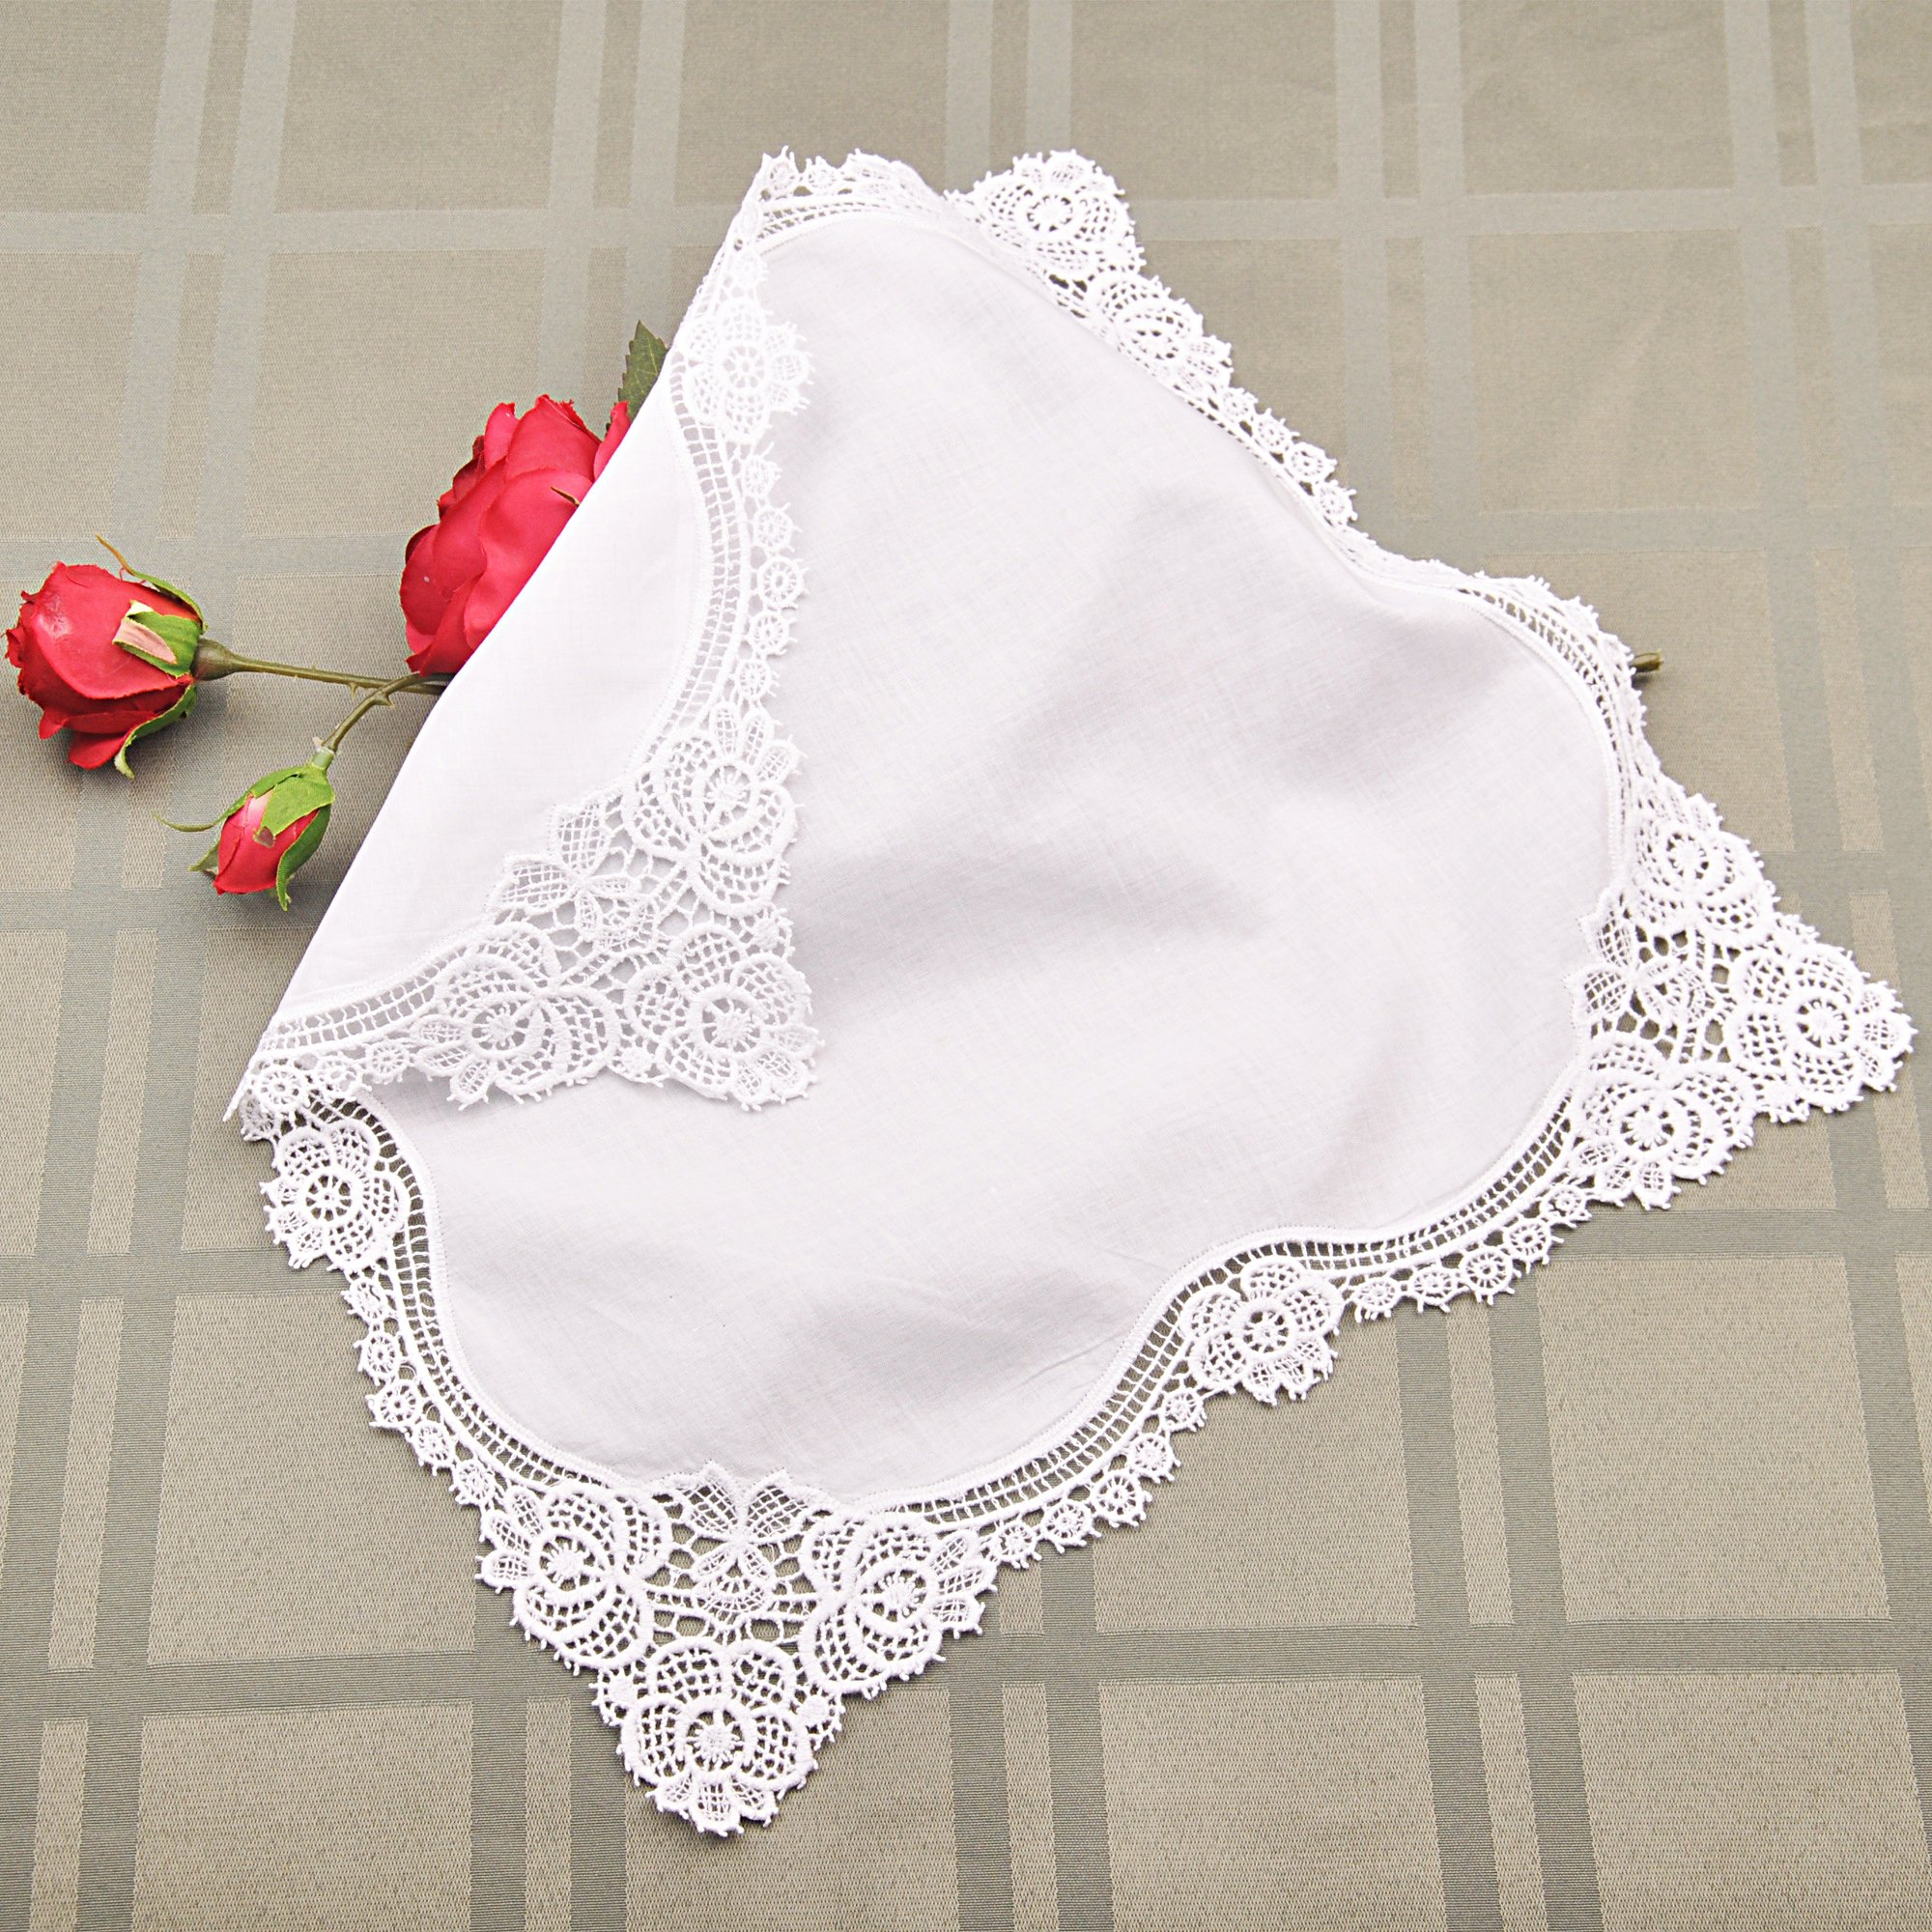 Milesky Bridal Wedding Crochet Lace Handkerchief Premium 60S Cotton CH02 by Milesky (Image #2)